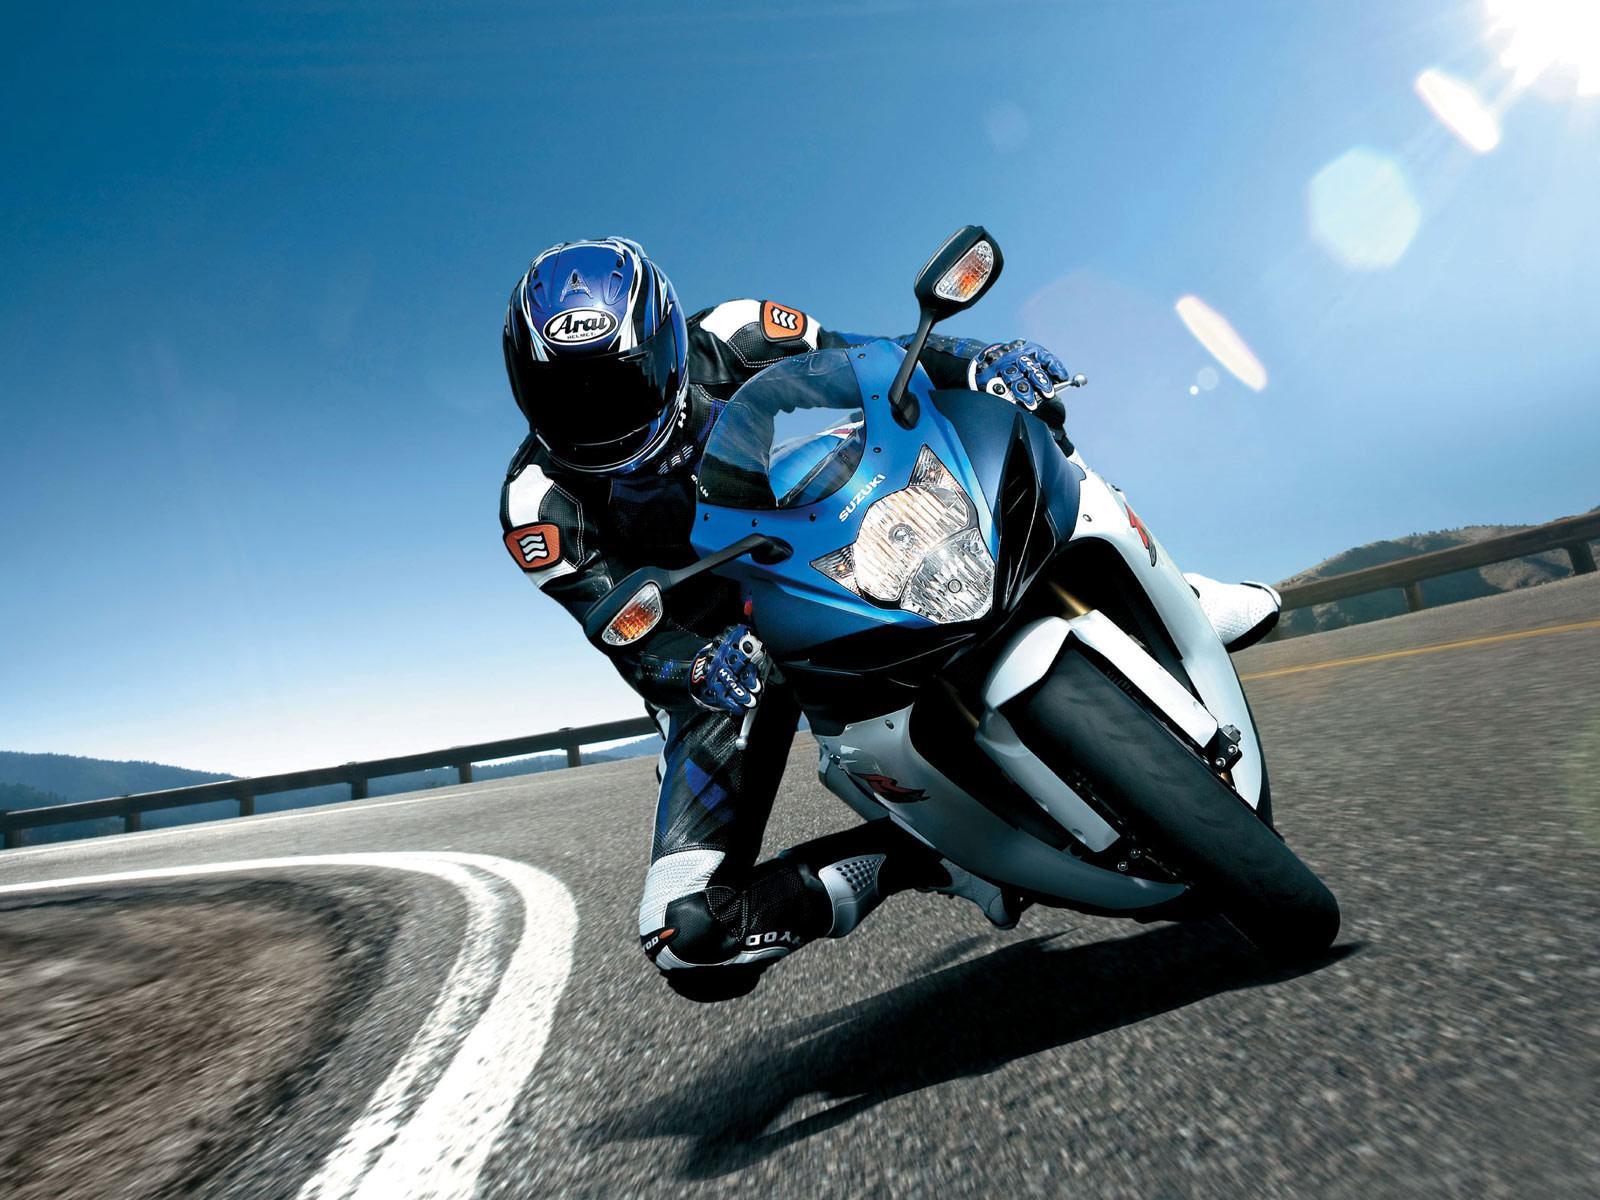 http://3.bp.blogspot.com/-vuGYKSdIfJQ/TuVPIjSZjdI/AAAAAAAAFMQ/IMCLTJIFKXg/s1600/2011_Suzuki_GSX-R_750_motorcycle-desktop-wallpaper_01.jpg